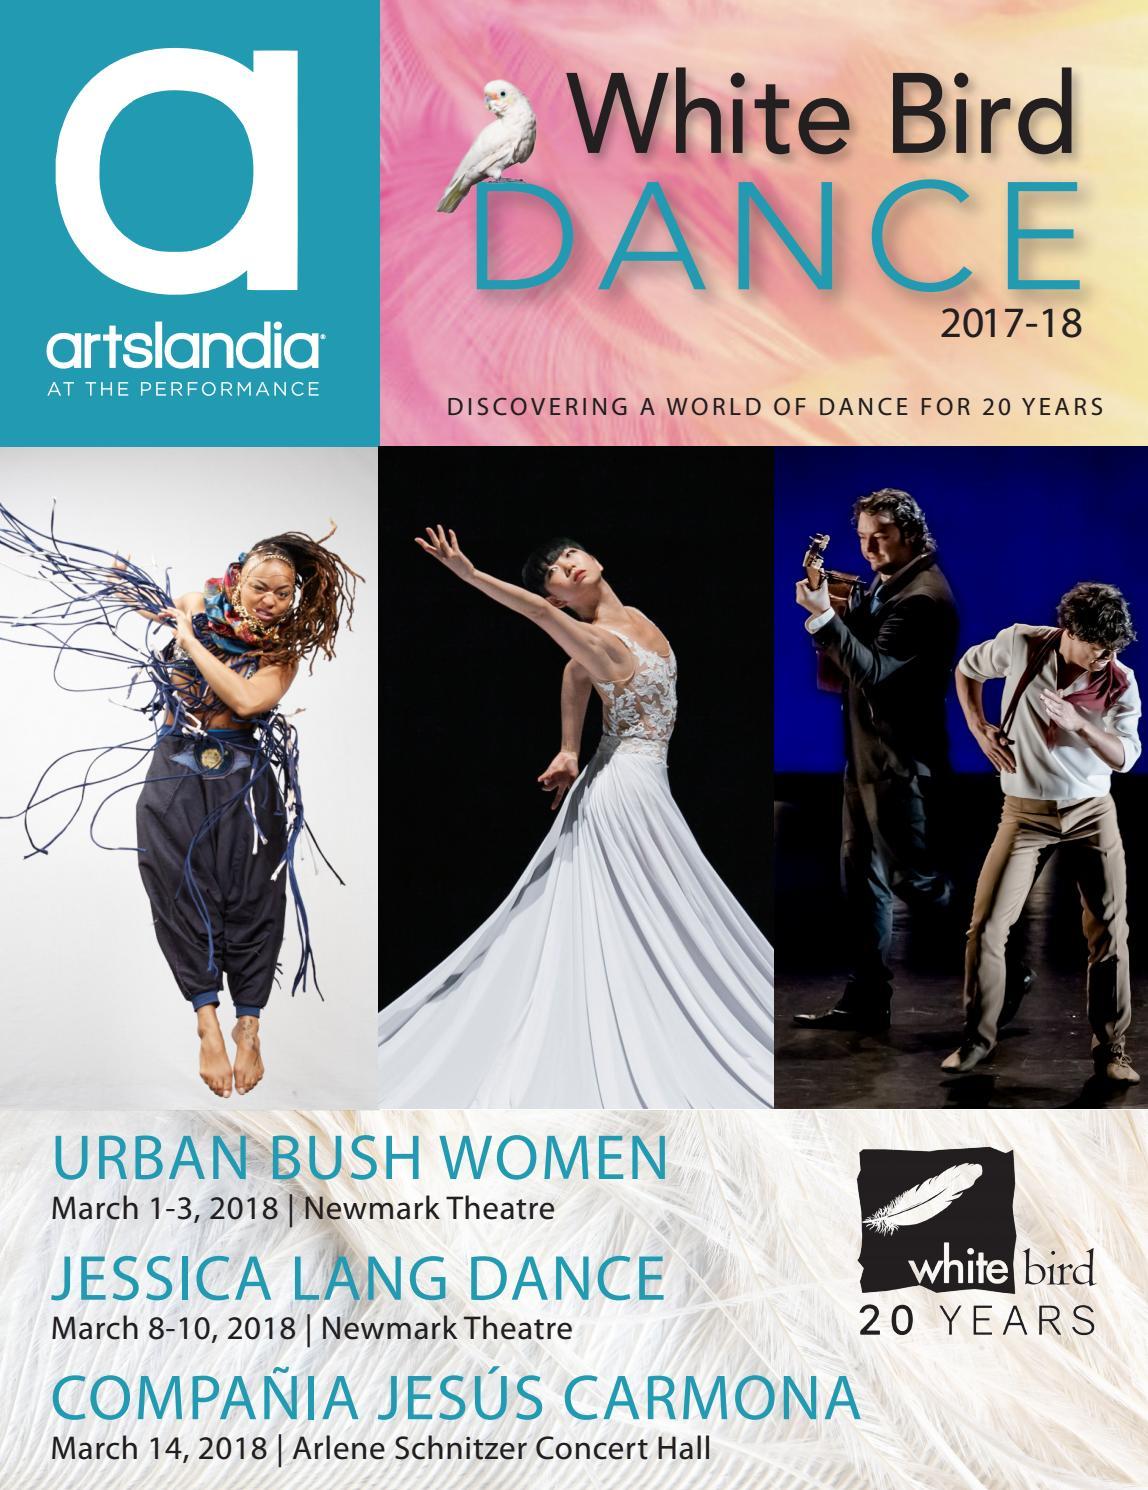 UrbanBush Women / Jessica Lang / Compania Jesus Carmona - White Bird Dance